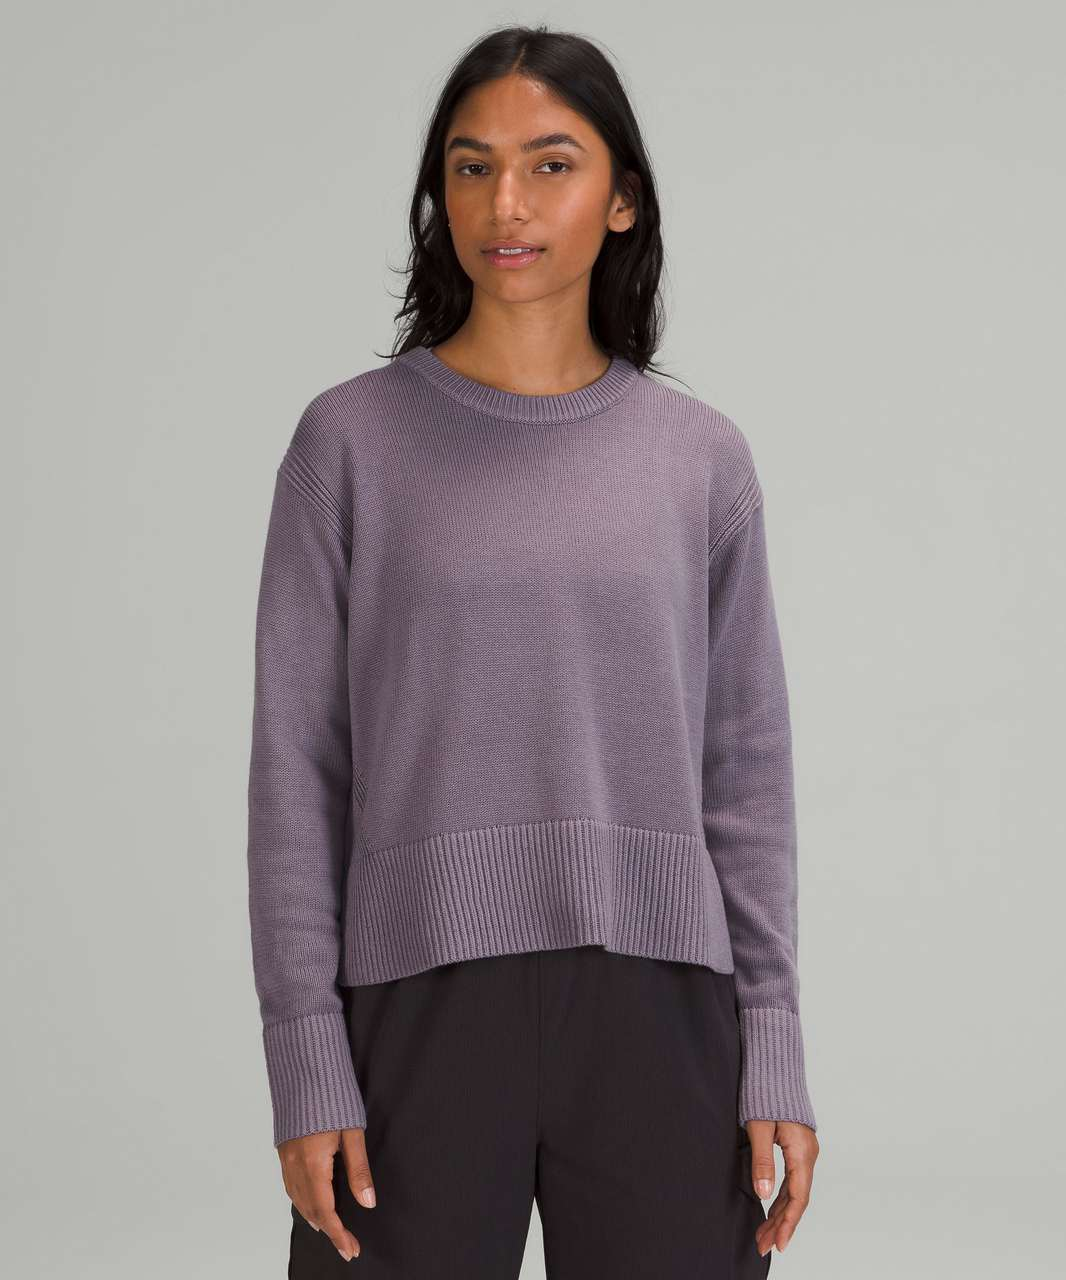 Lululemon Cashlu Boxy Crewneck Sweater - Dusky Lavender